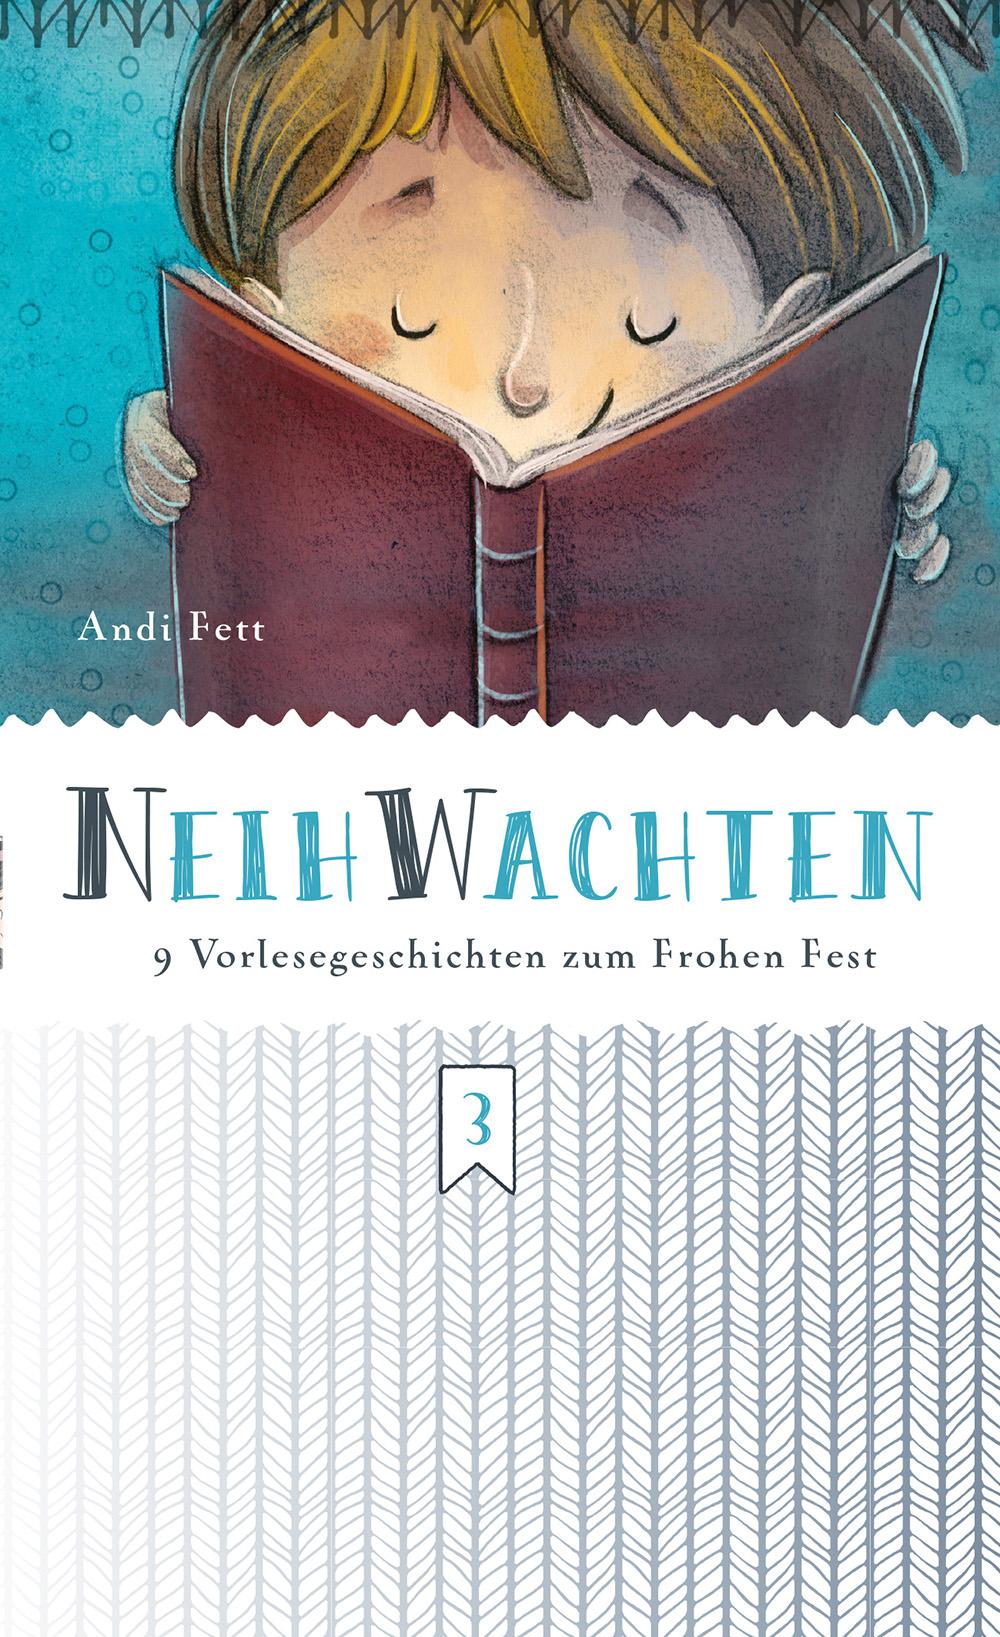 CLV_neihwachten_andreas-fett_256185_1